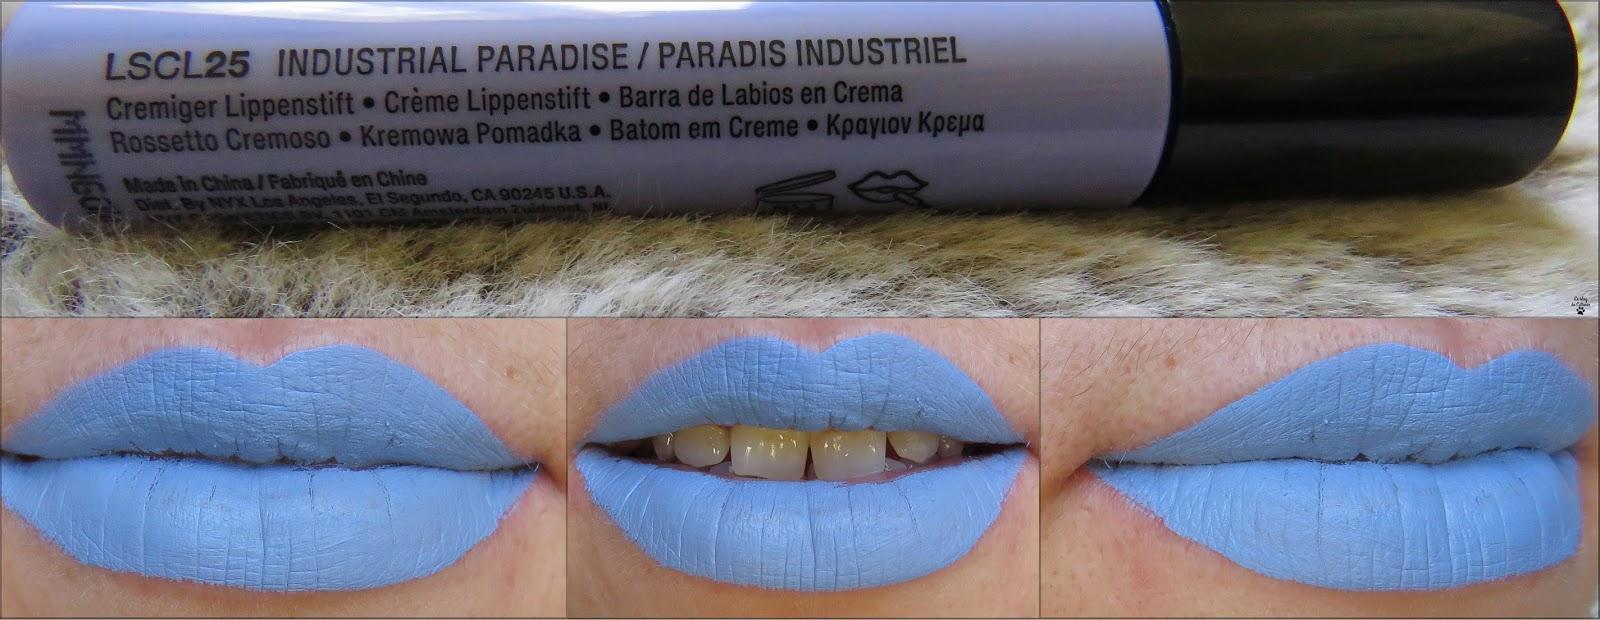 Industrial Paradise - Paradis industriel